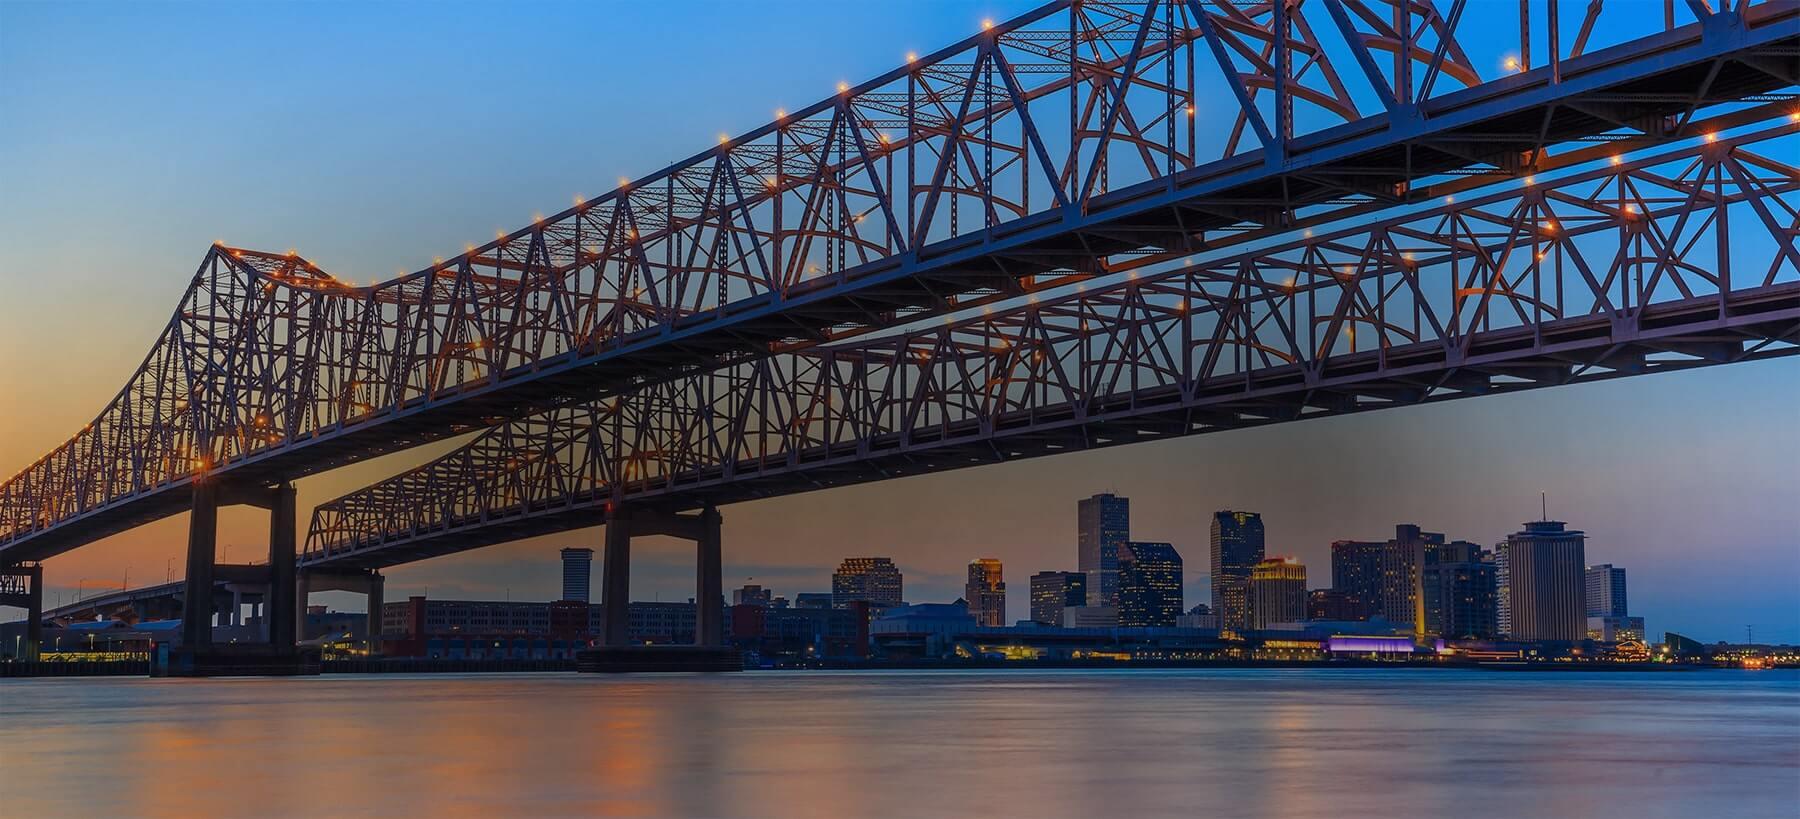 physicians resource bridge